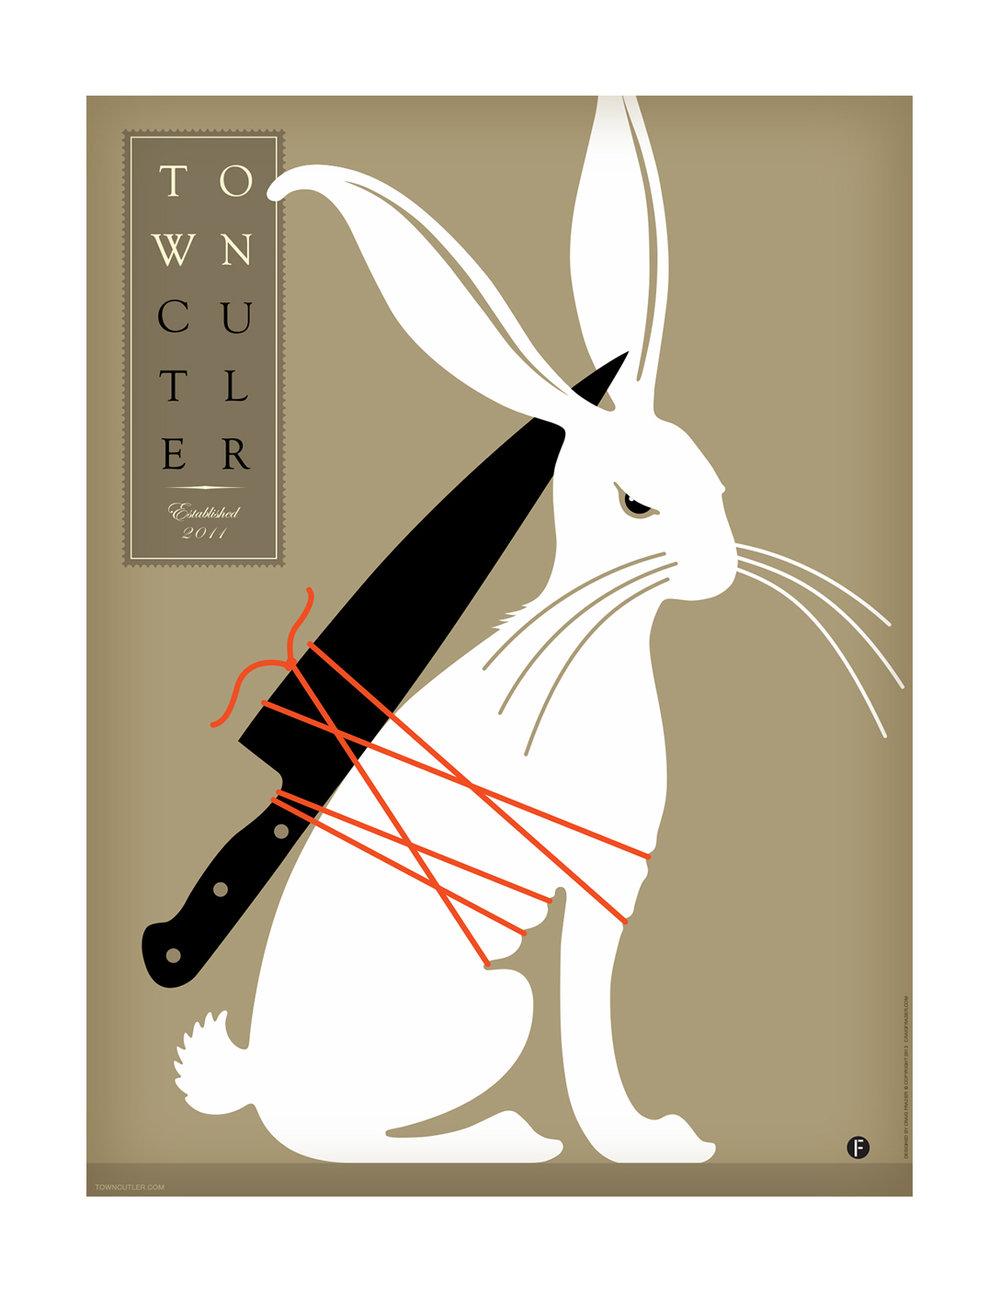 Towncutler.poster_web.jpg